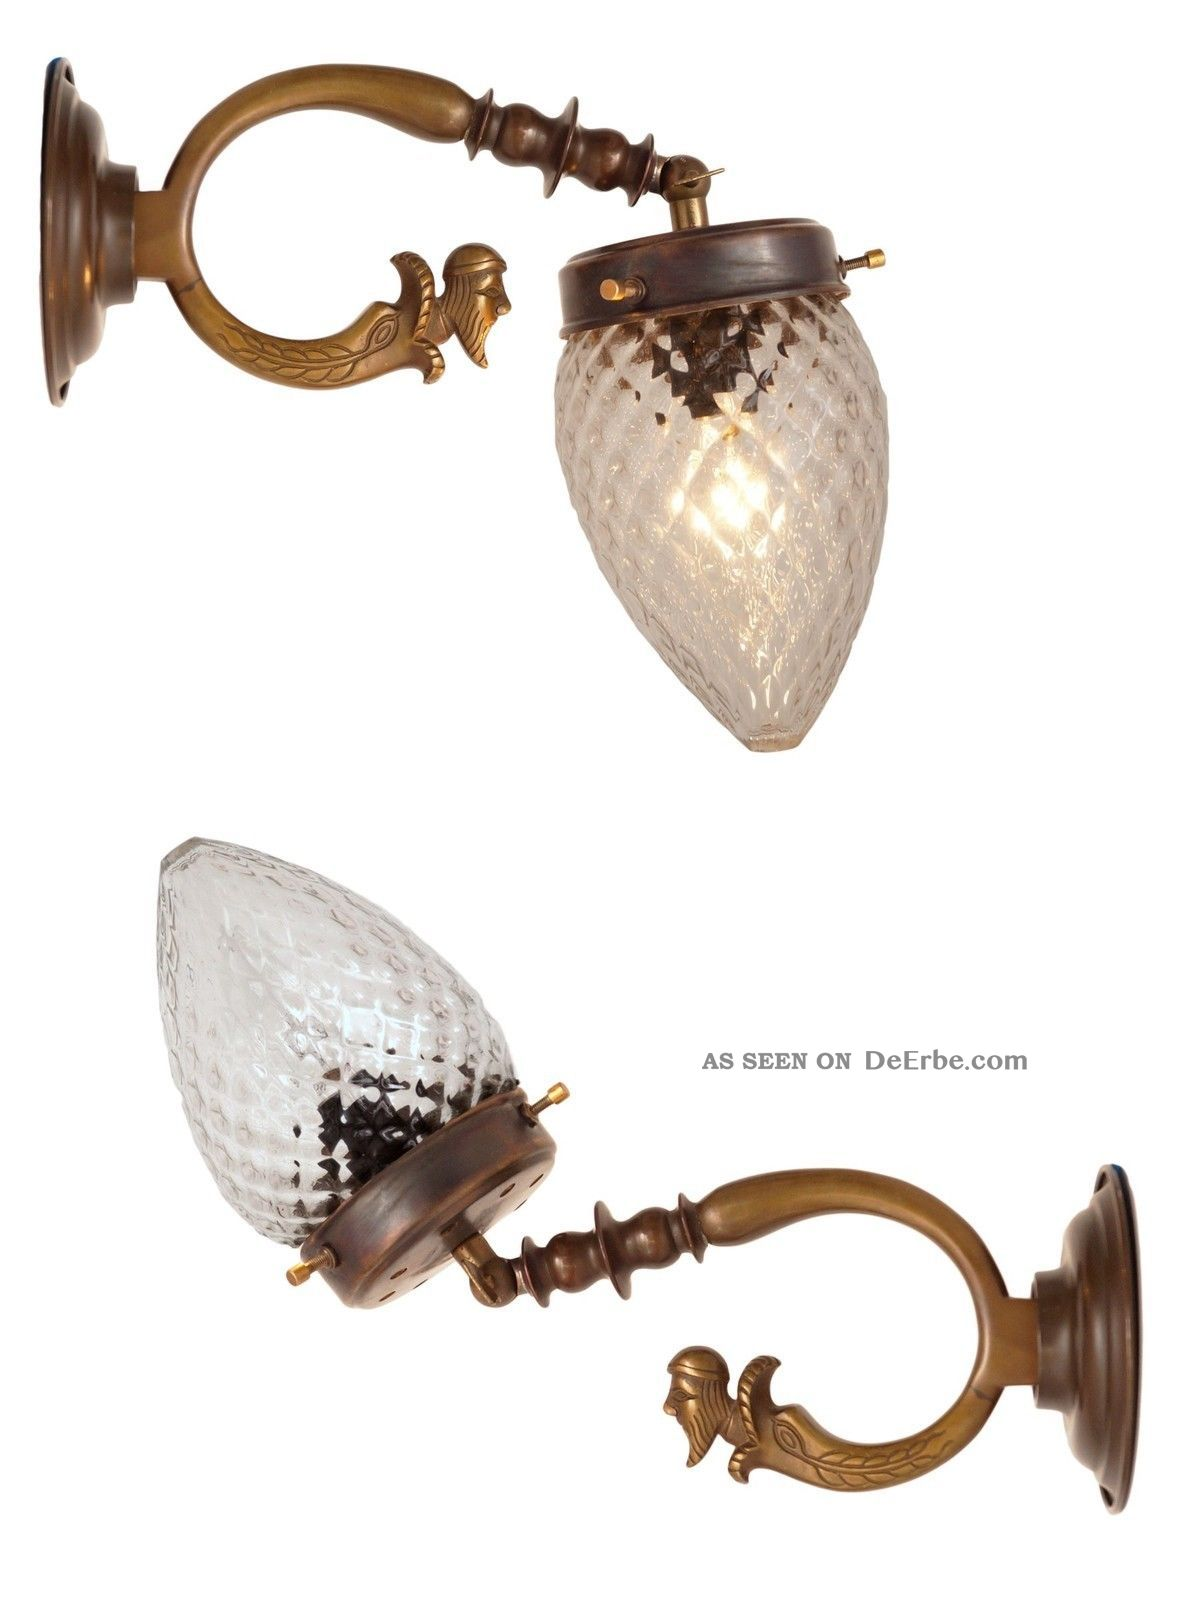 Seltene Orig.  Franz.  Jugendstil Wandleuchte Wandlampe Figur 4 Stk.  Verfügbar Antike Originale vor 1945 Bild